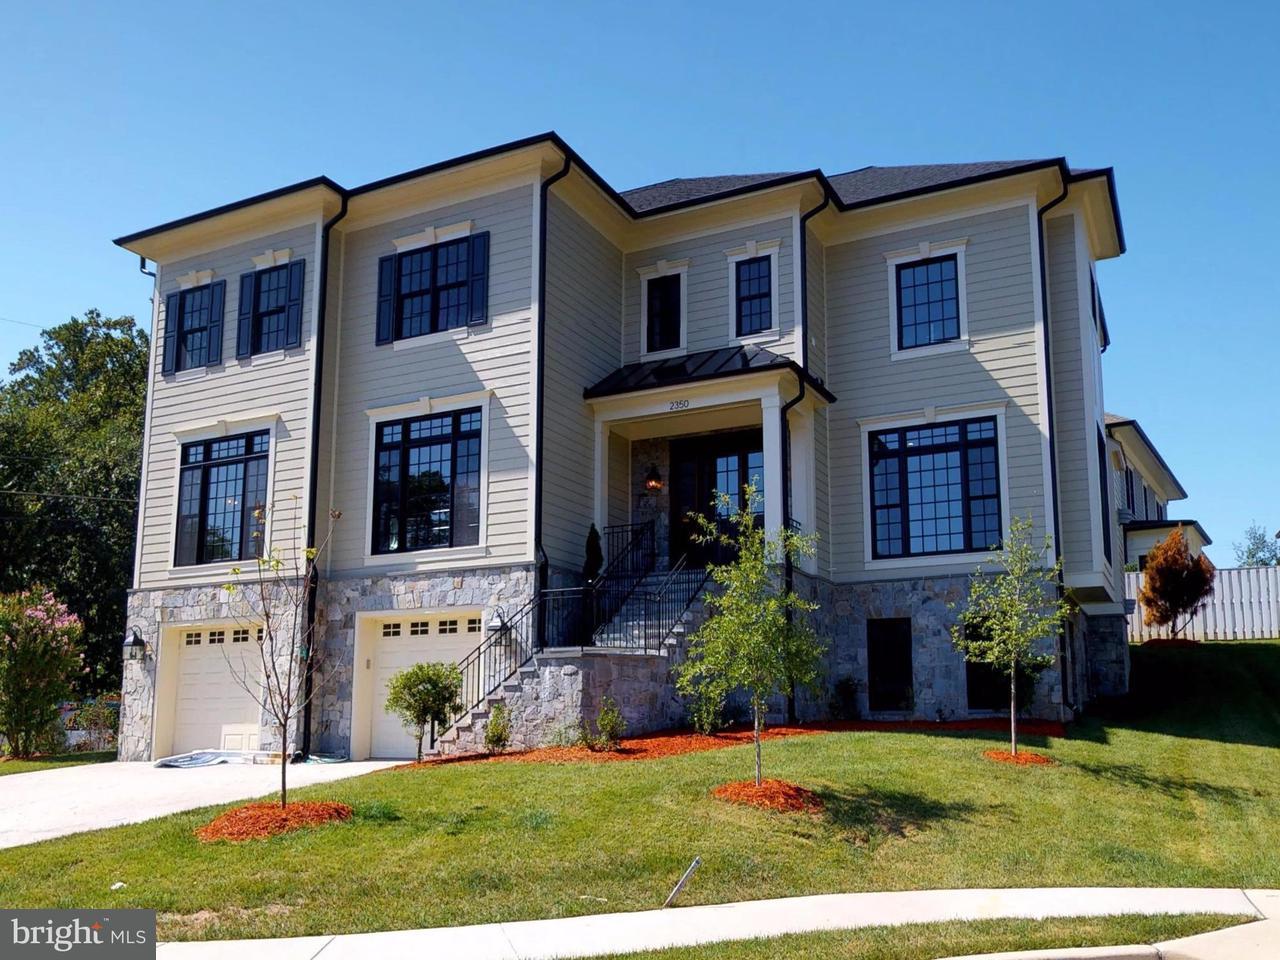 Single Family Home for Sale at 2350 Daniel Street 2350 Daniel Street Arlington, Virginia 22207 United States